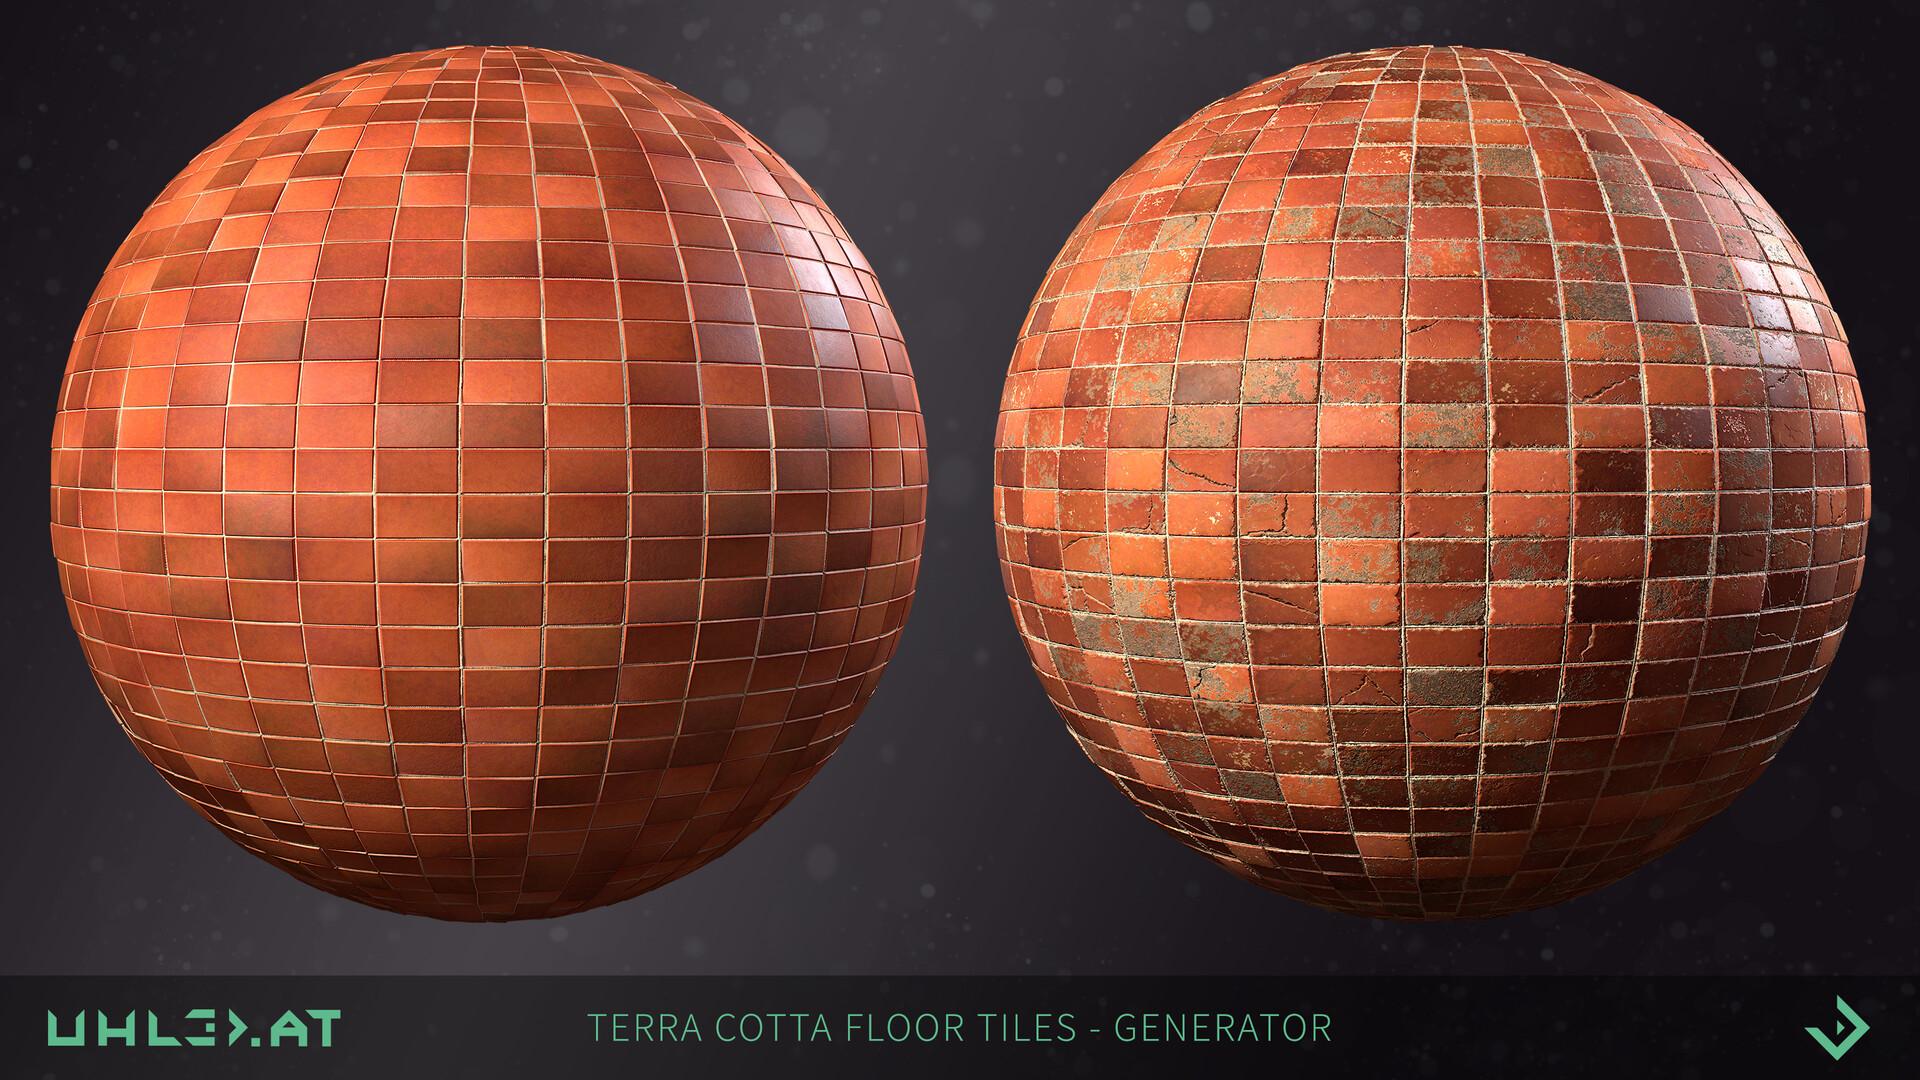 Dominik uhl terracottafloor generator pattern 04